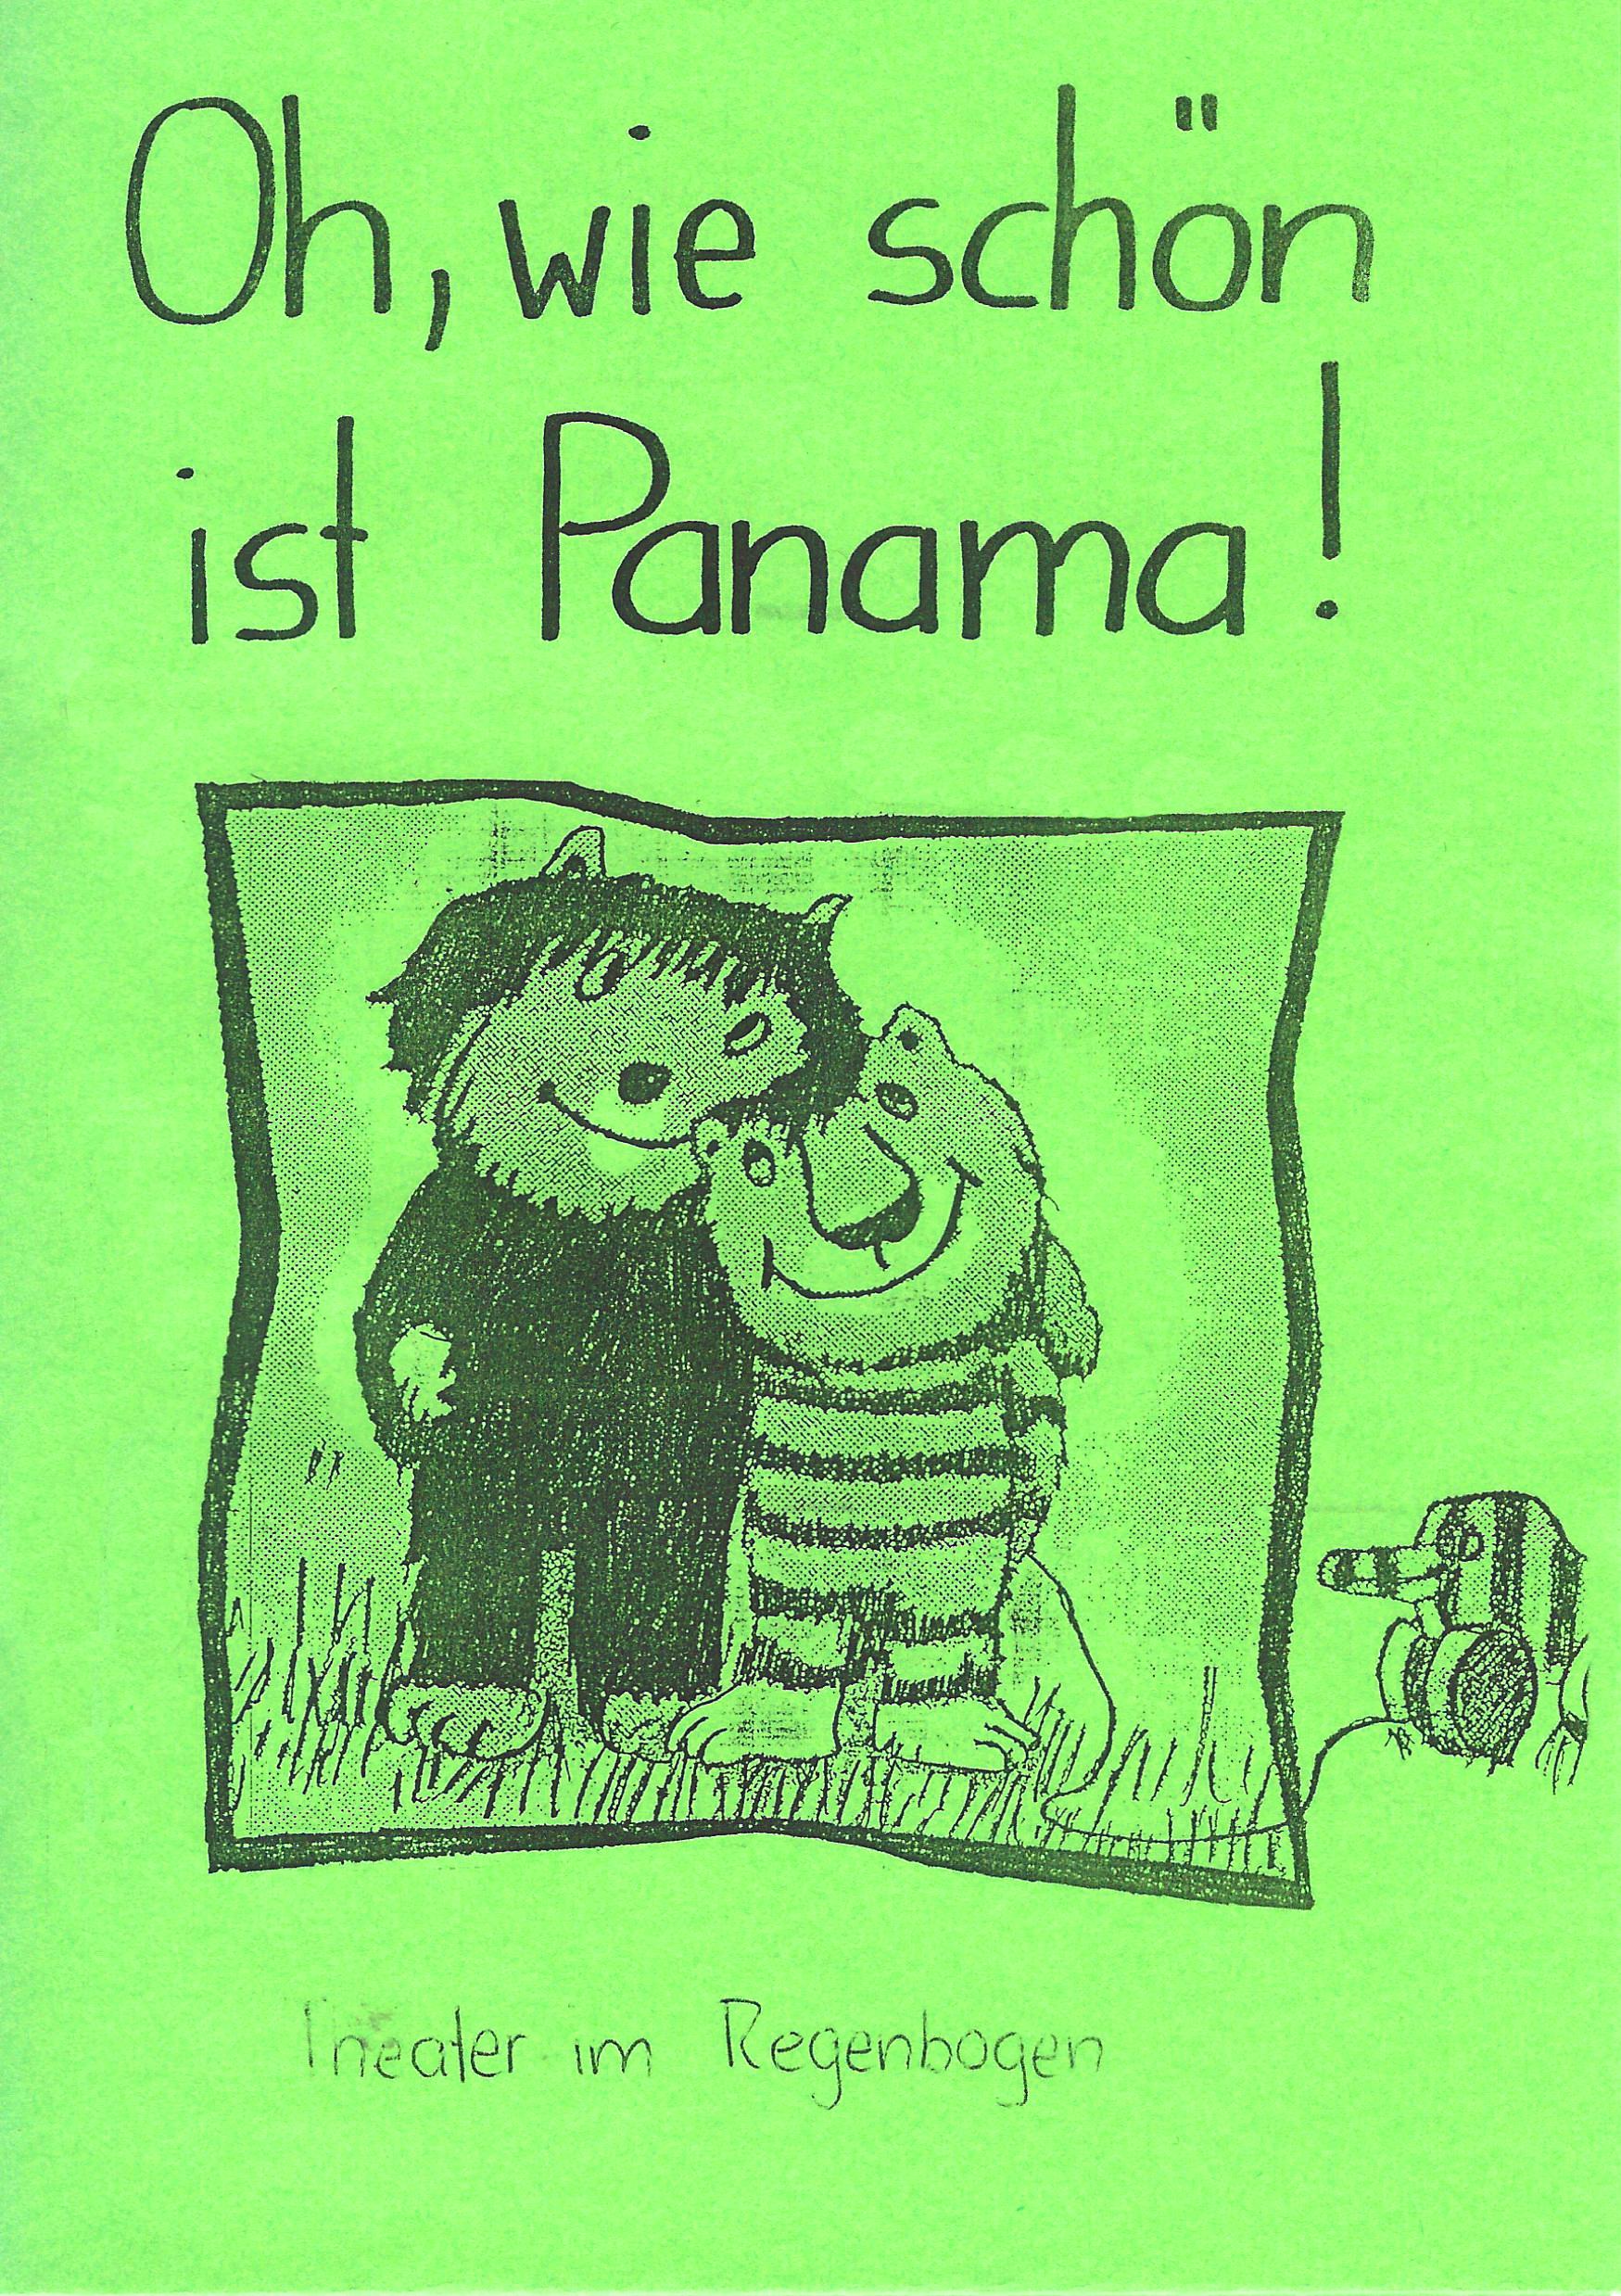 1994 O wie schön ist Panama Plakat.jpg